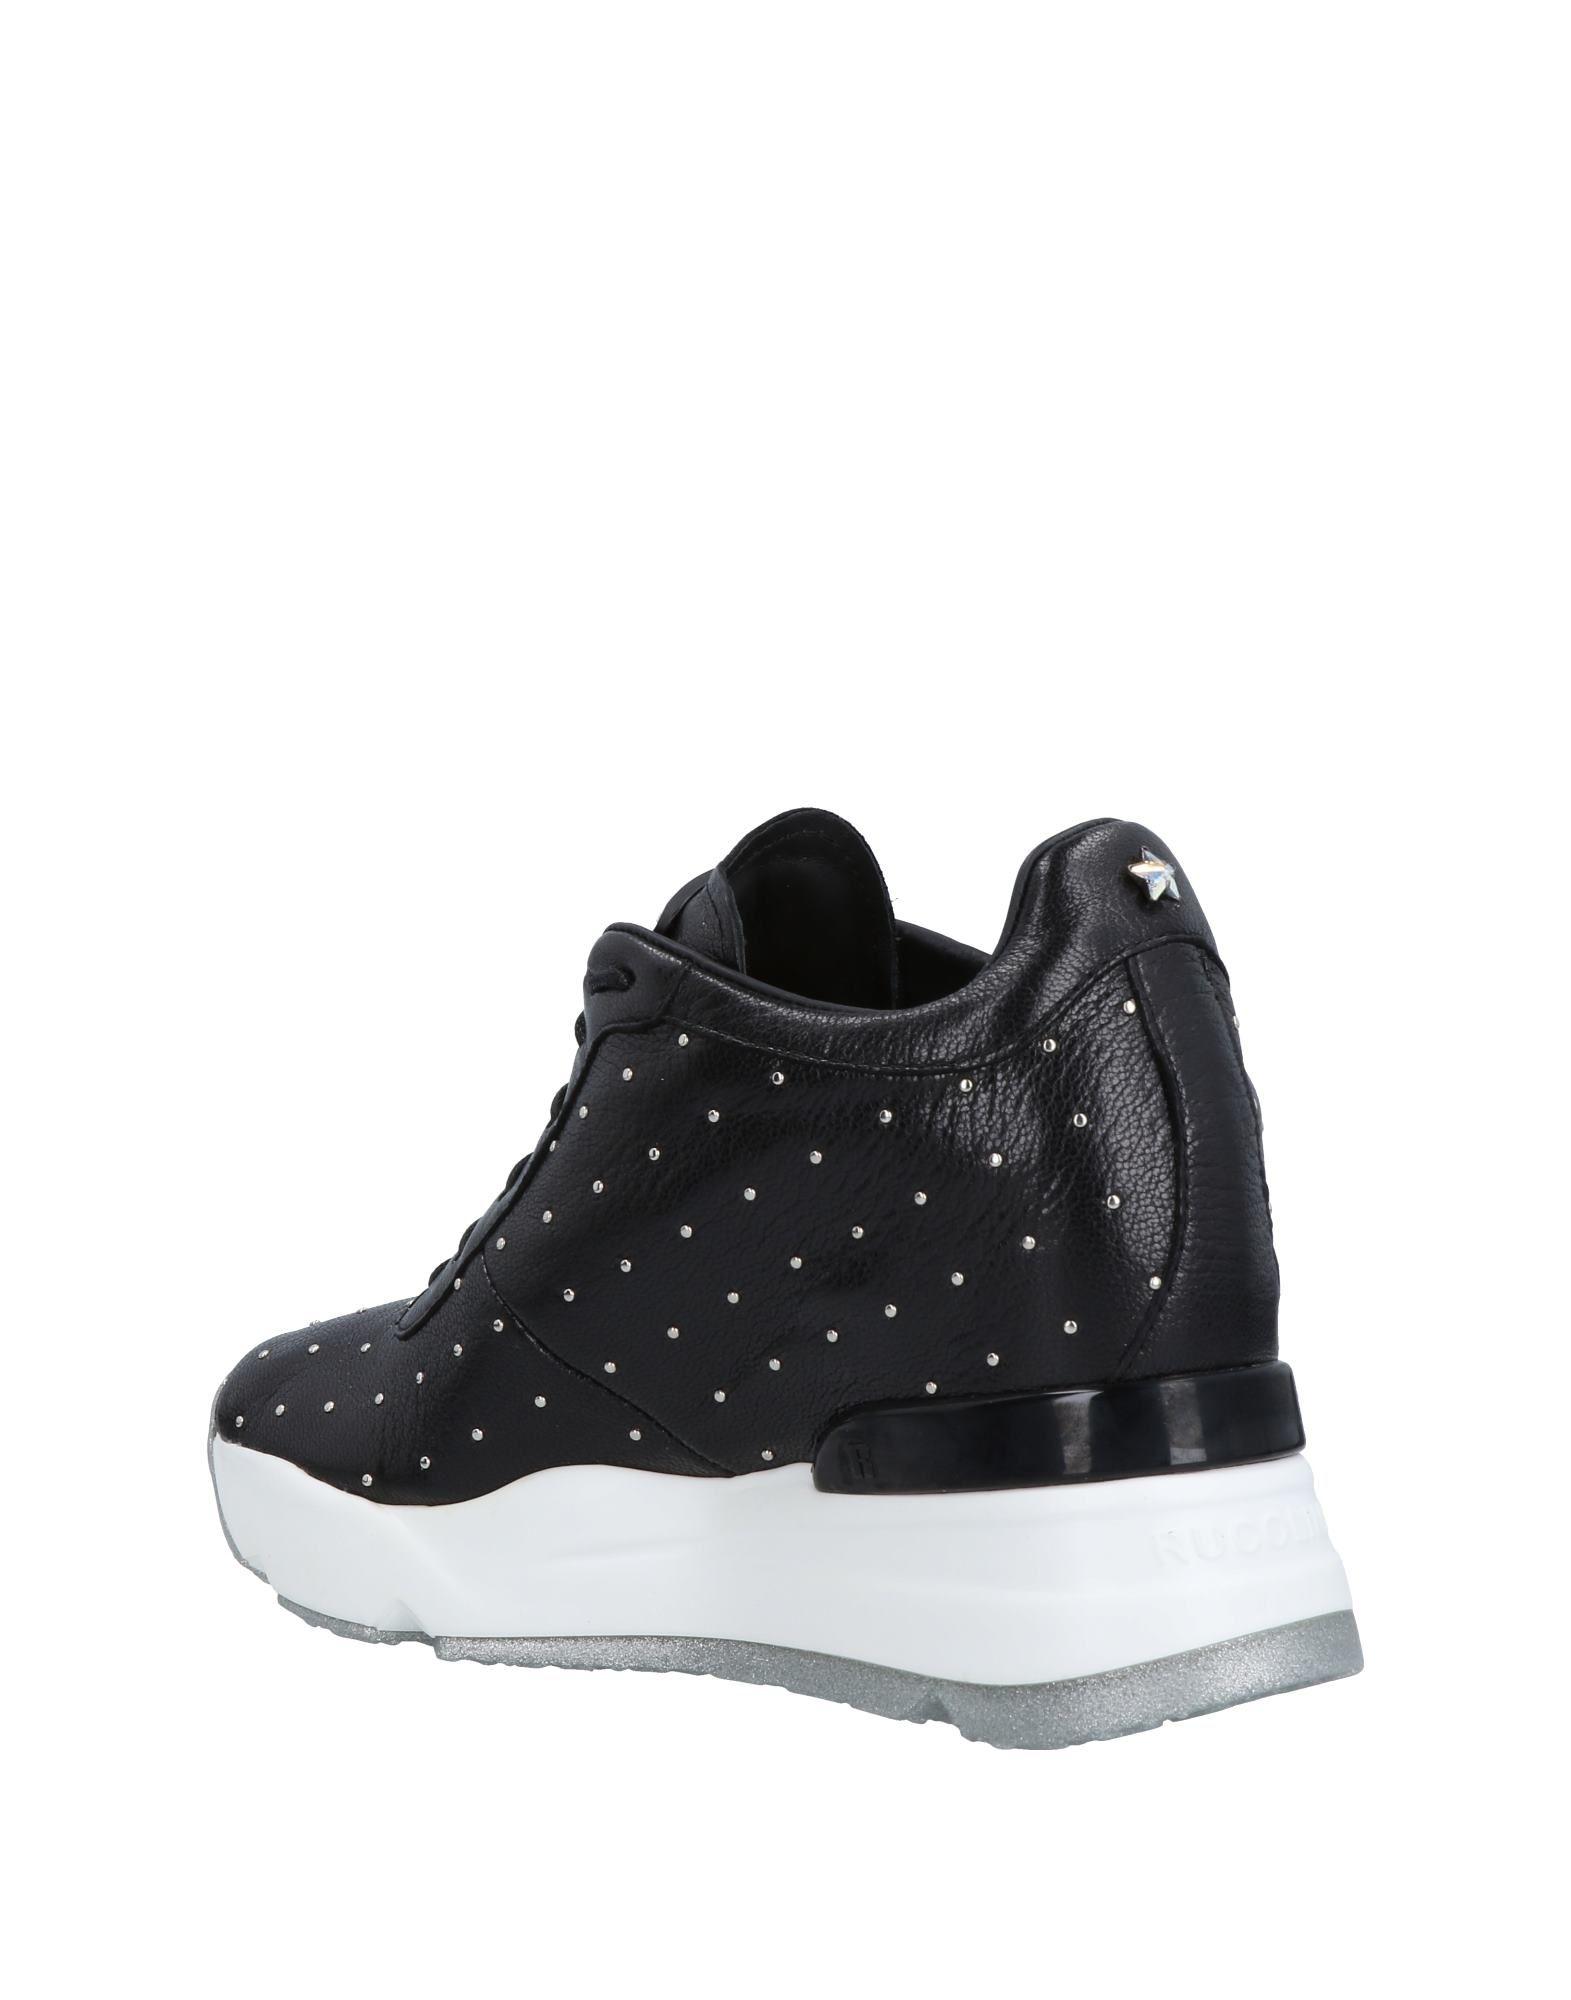 Stilvolle Sneakers billige Schuhe Ruco Line Sneakers Stilvolle Damen  11492142IV 43112f